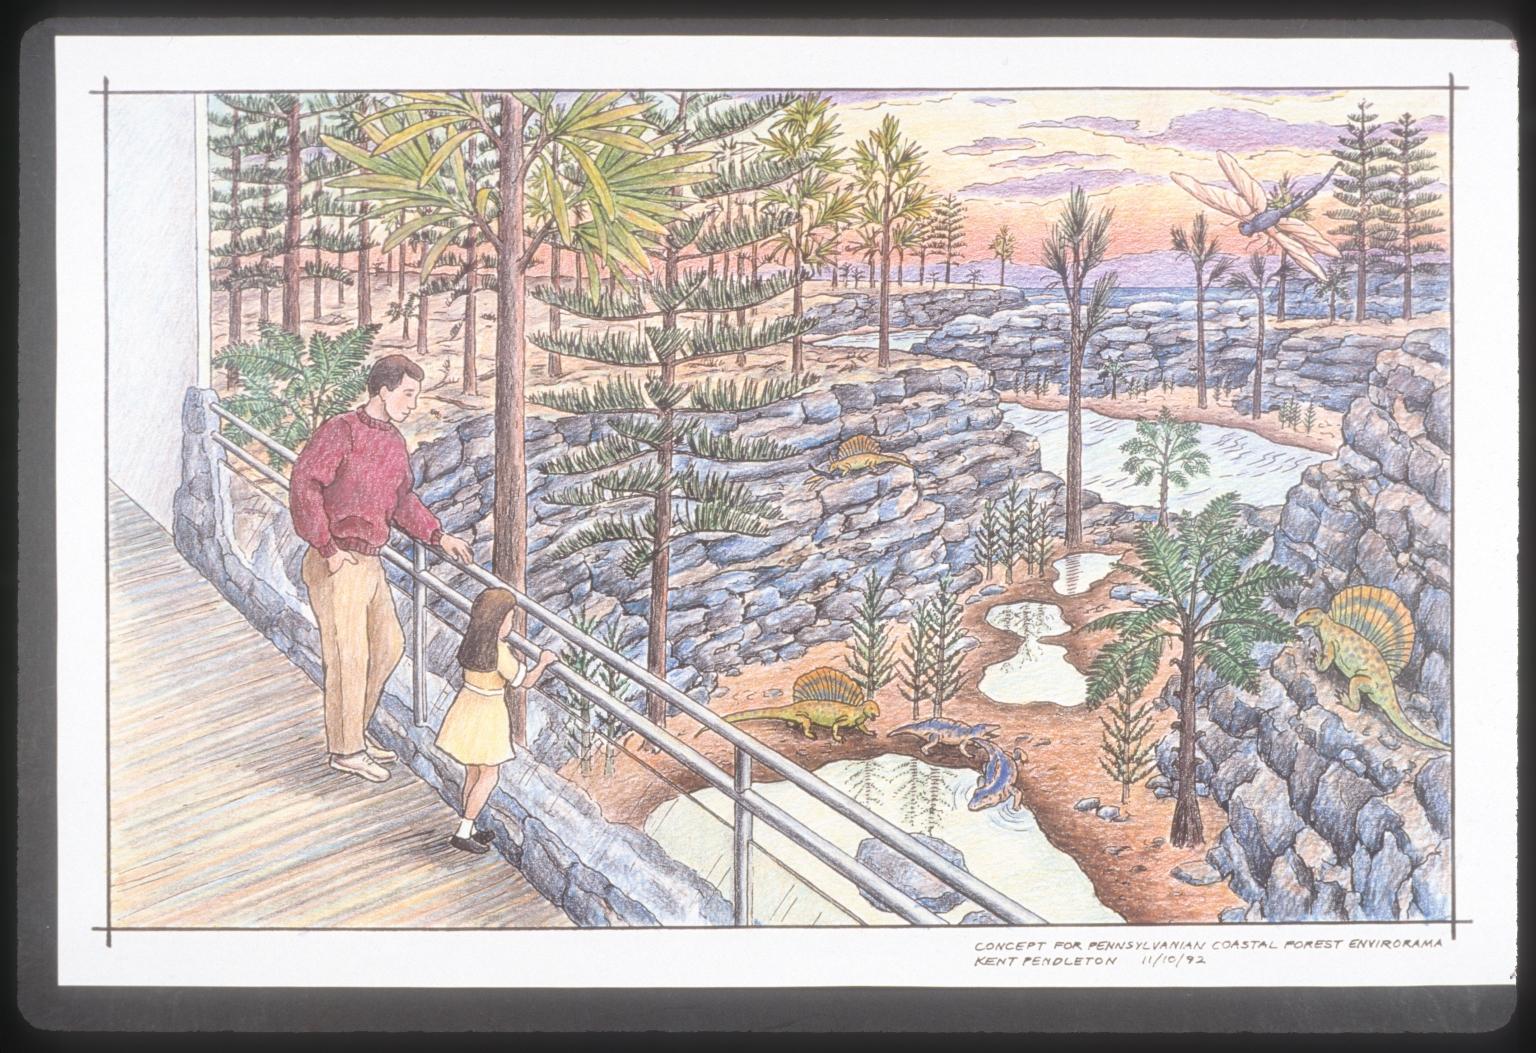 Artists conceptions of Prehistoric Journey Exhibit